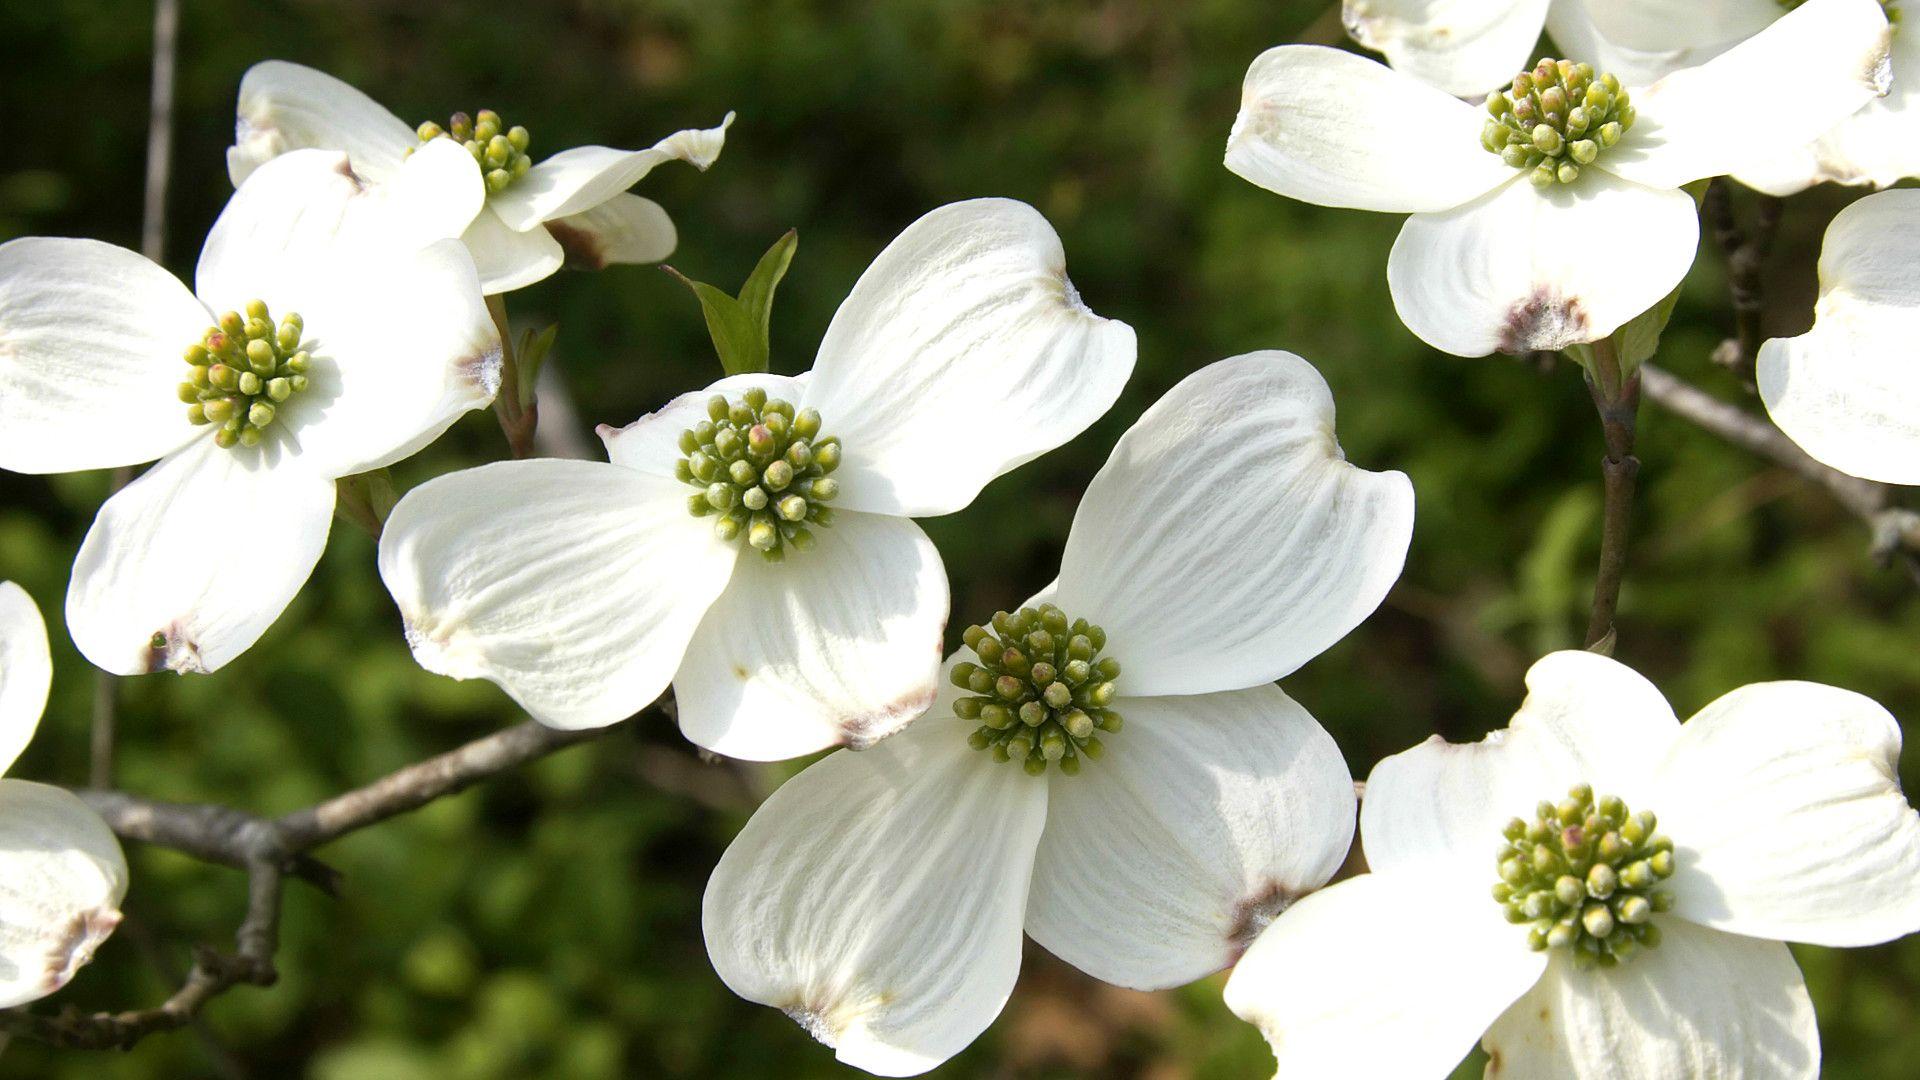 White Dogwood A Crowd Pleaser Dogwood Blooms Bloom Dogwood Trees